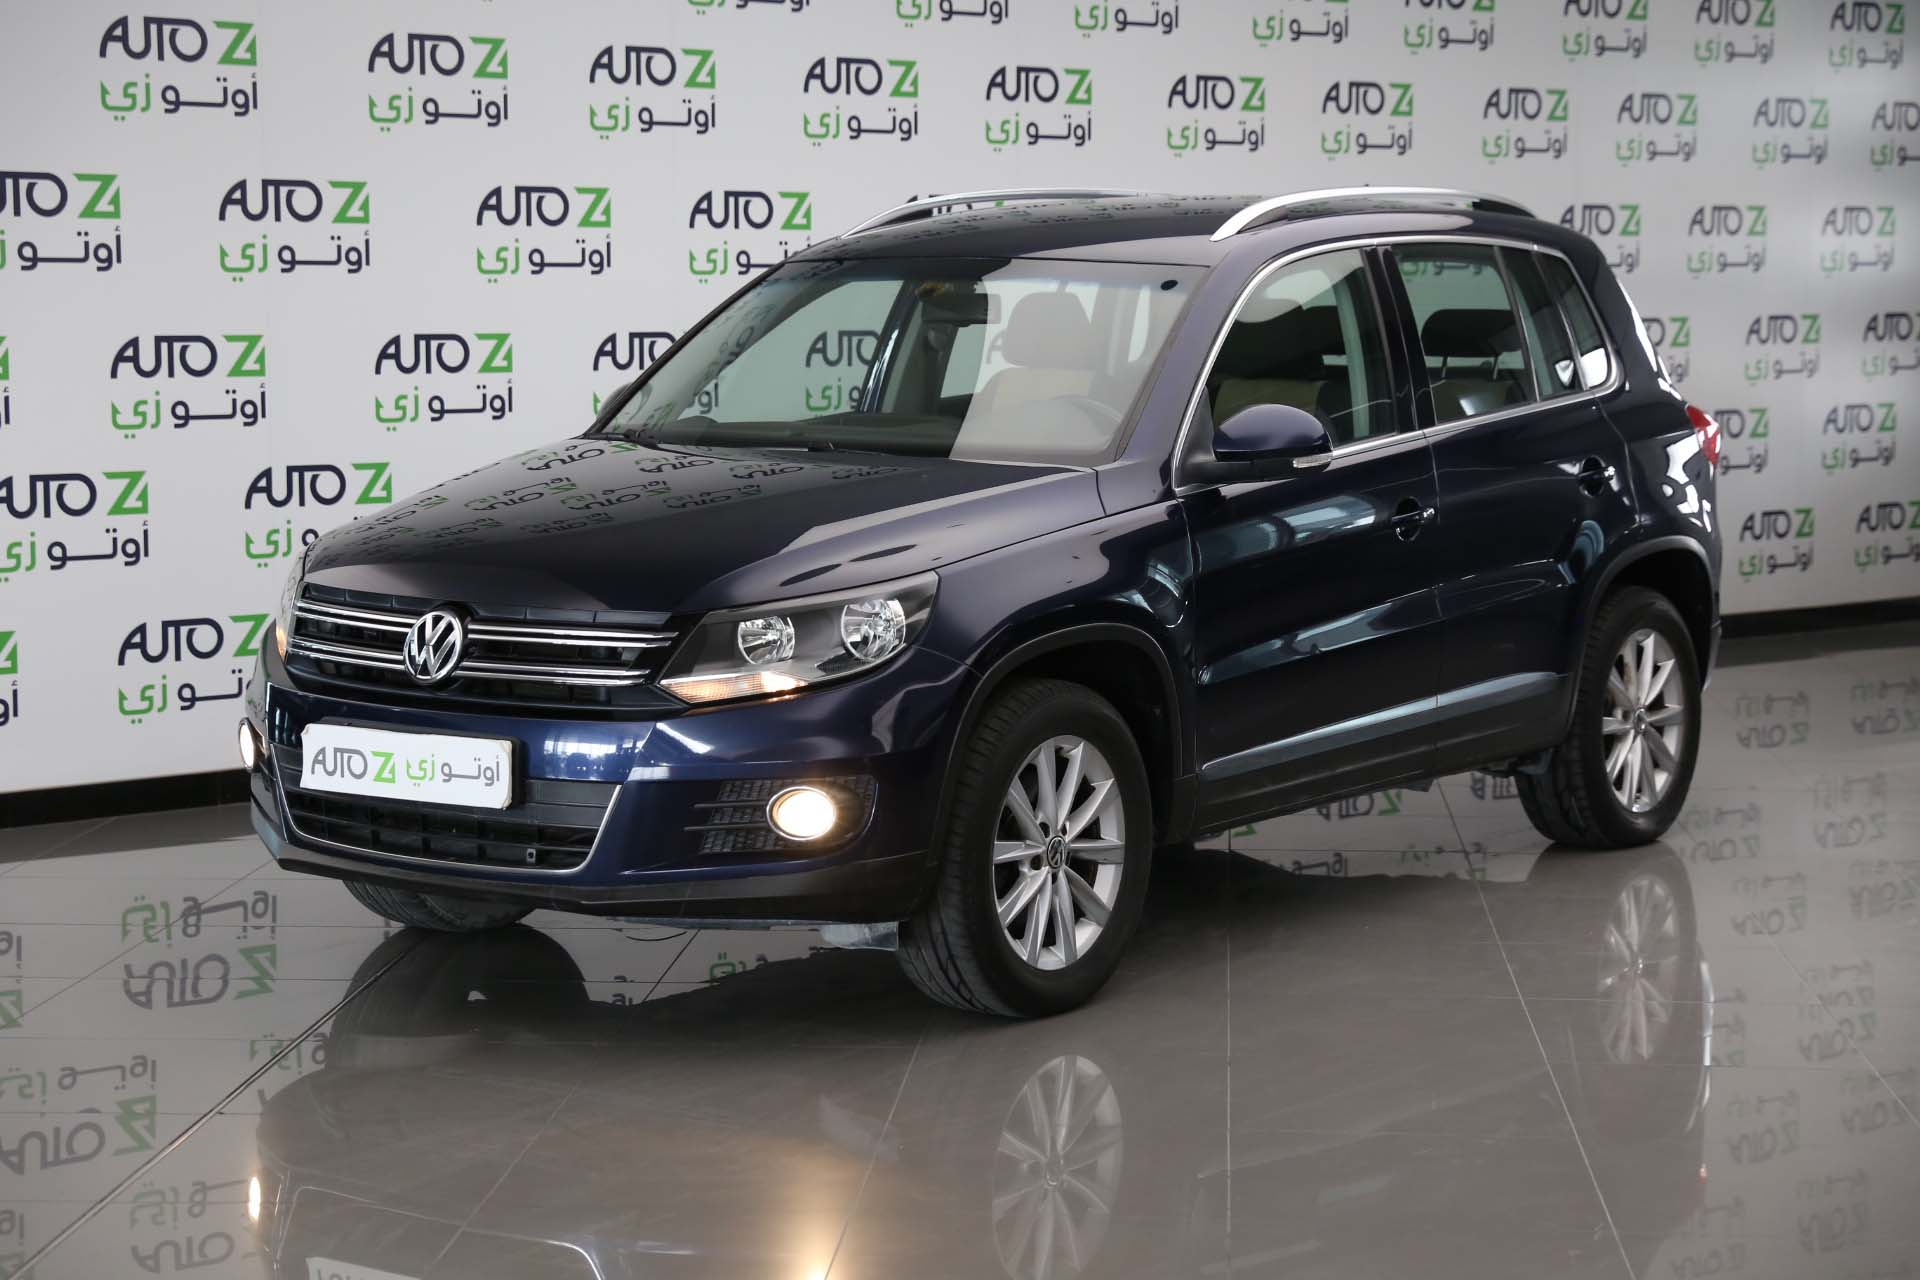 Volkswagen TIGUAN 2.0 TSI—Blue-2016